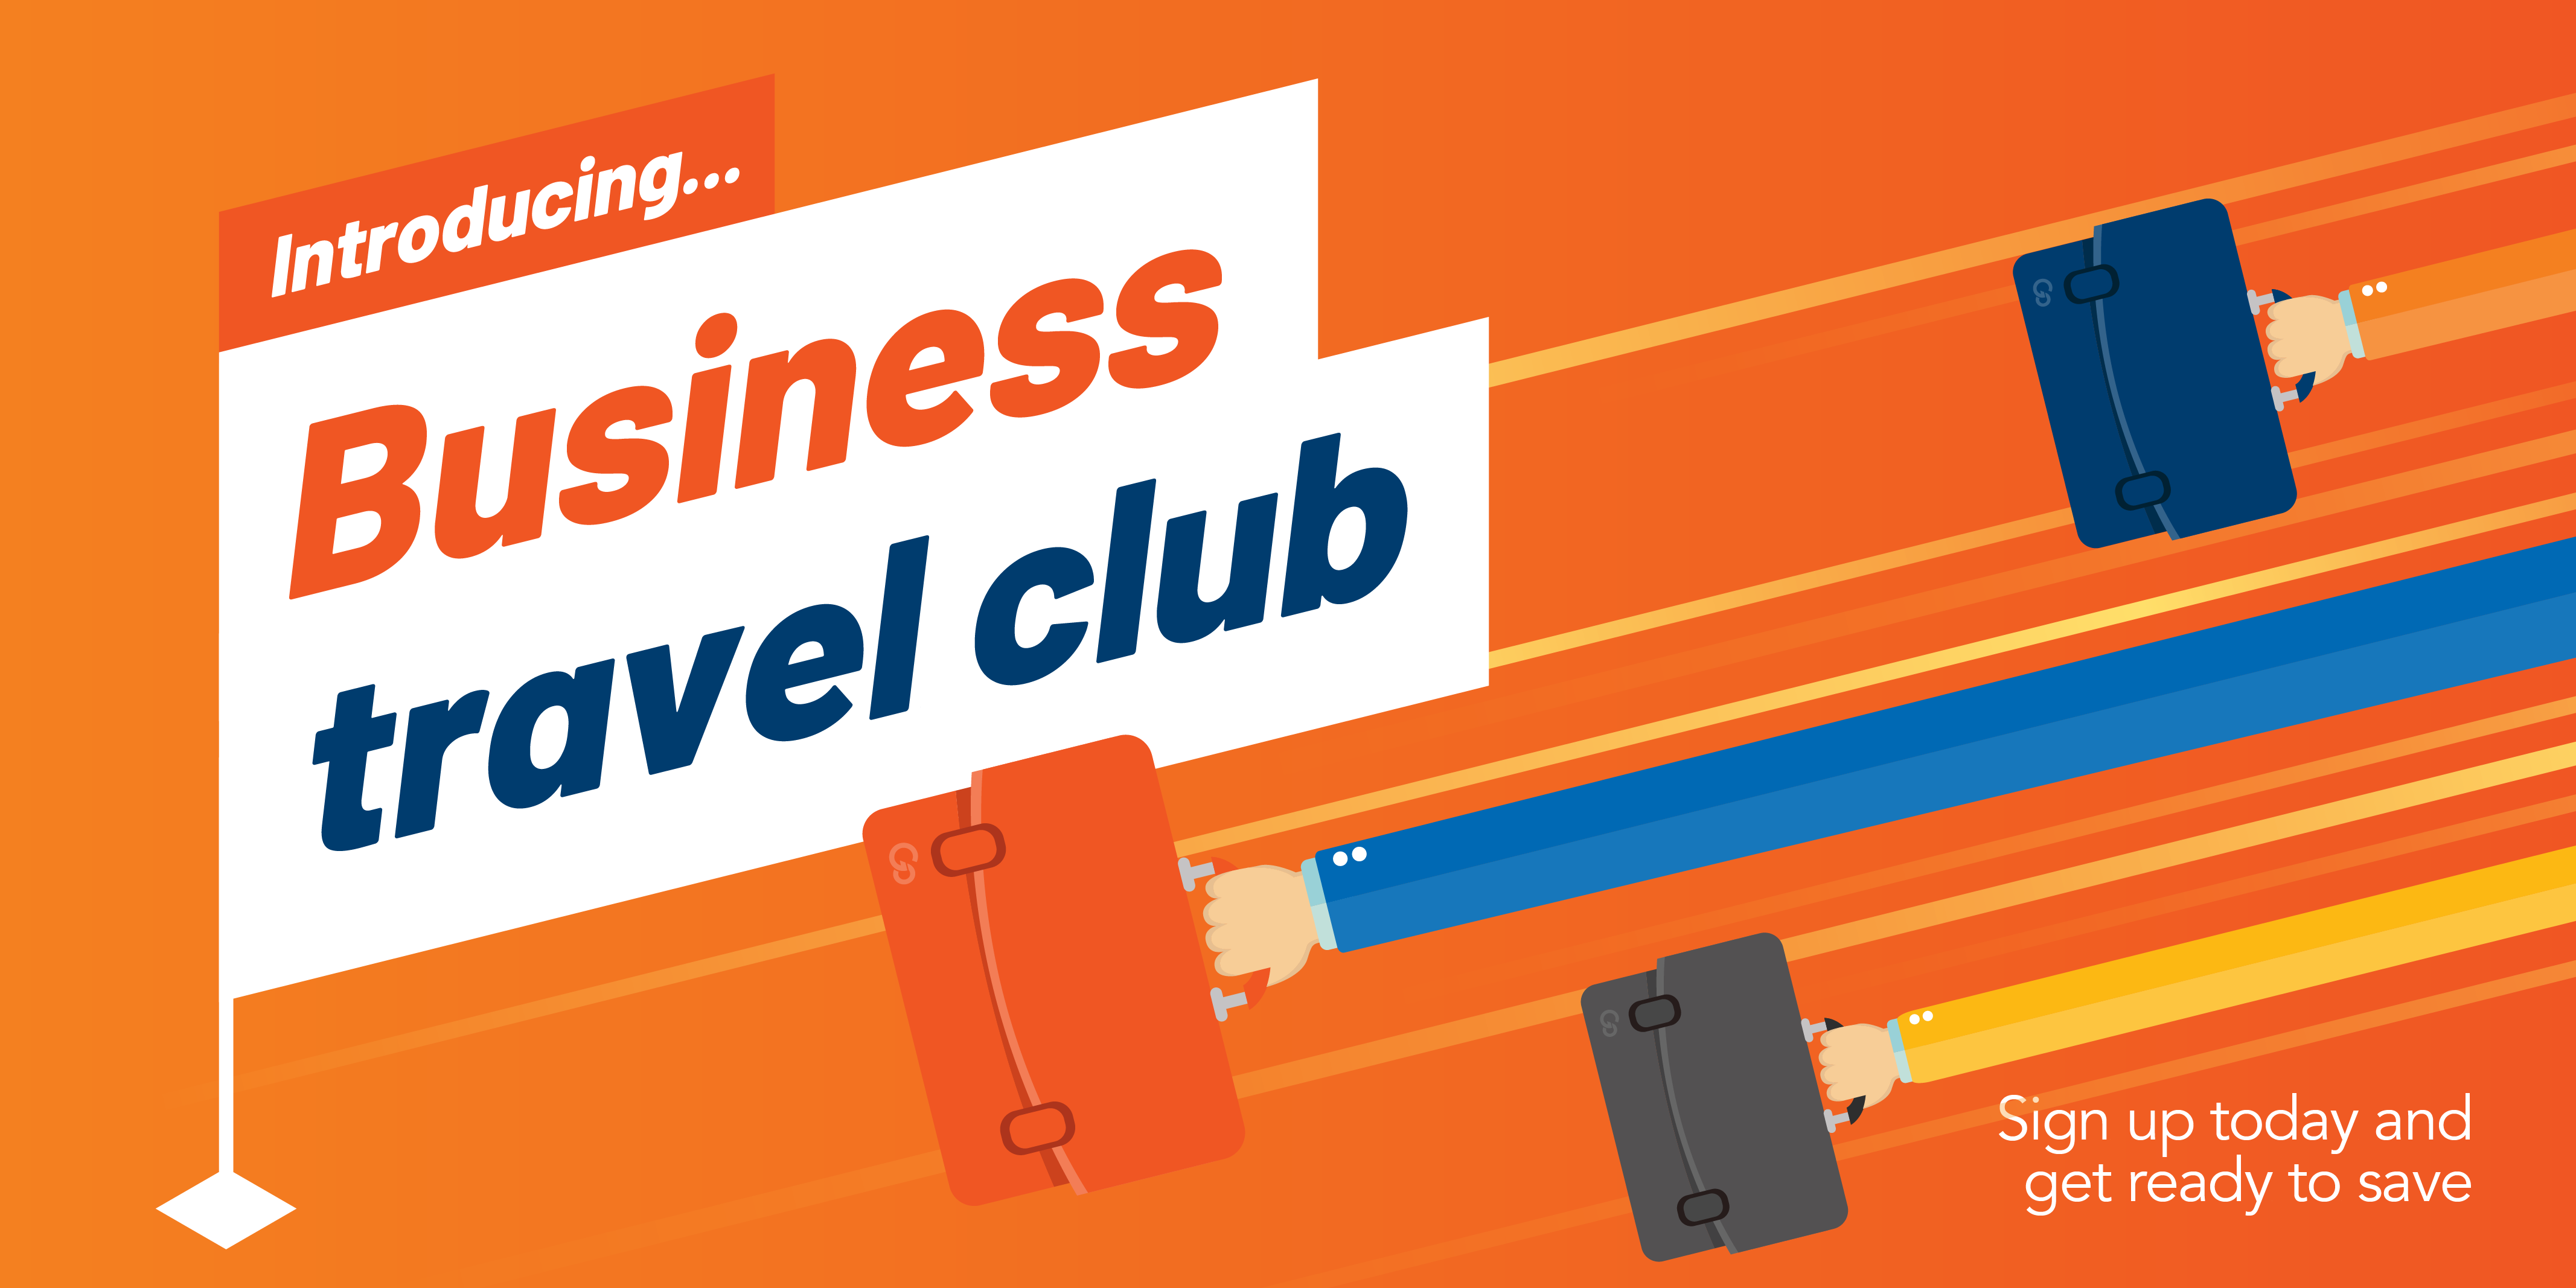 Business Travel Club